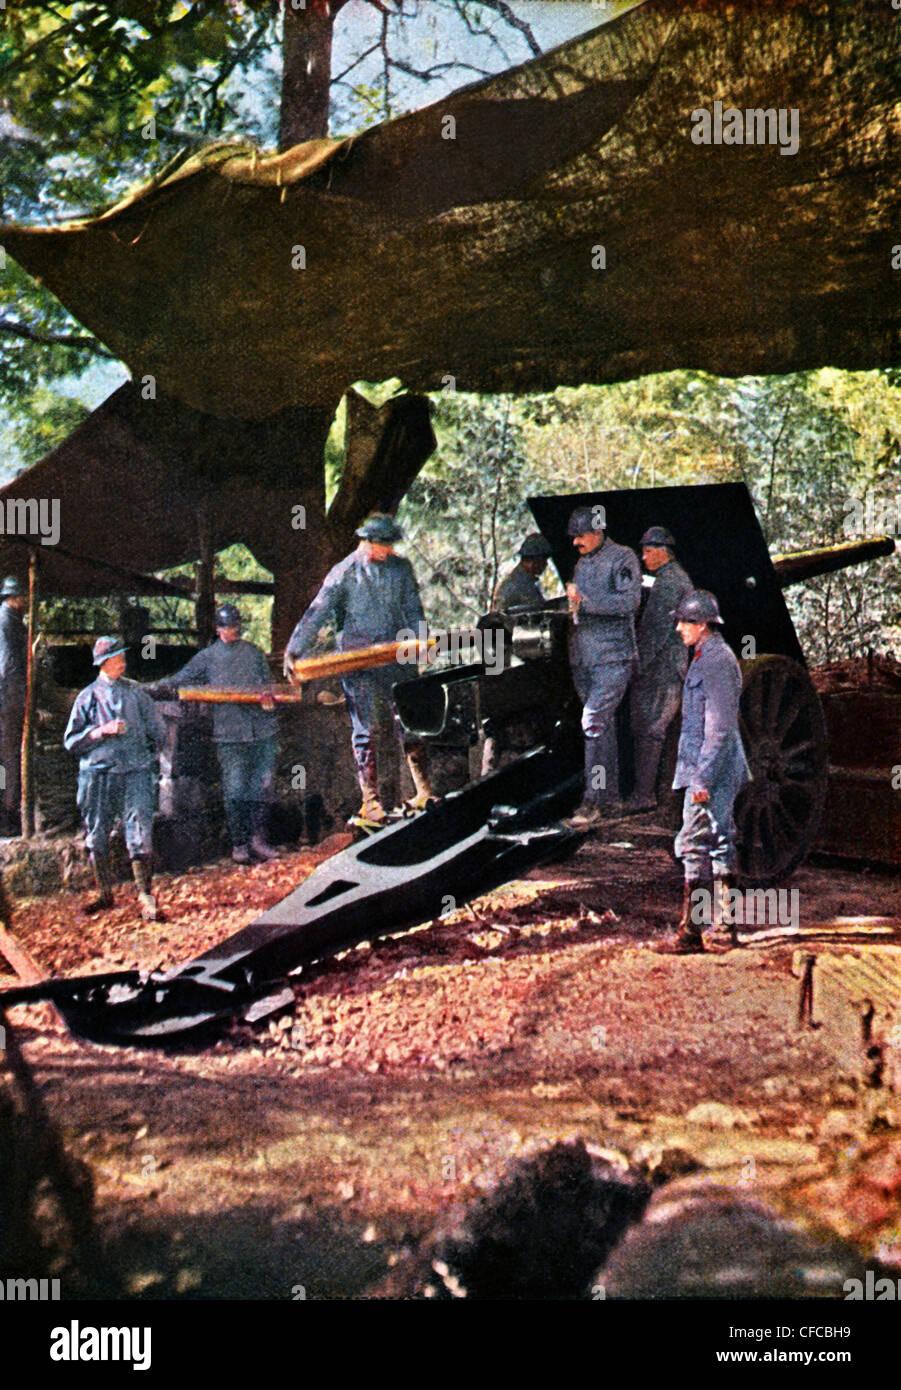 French, battery, heavy, guns, camouflage, netting, forest, Battle, Verdun, Western Front, World War I, War, World - Stock Image